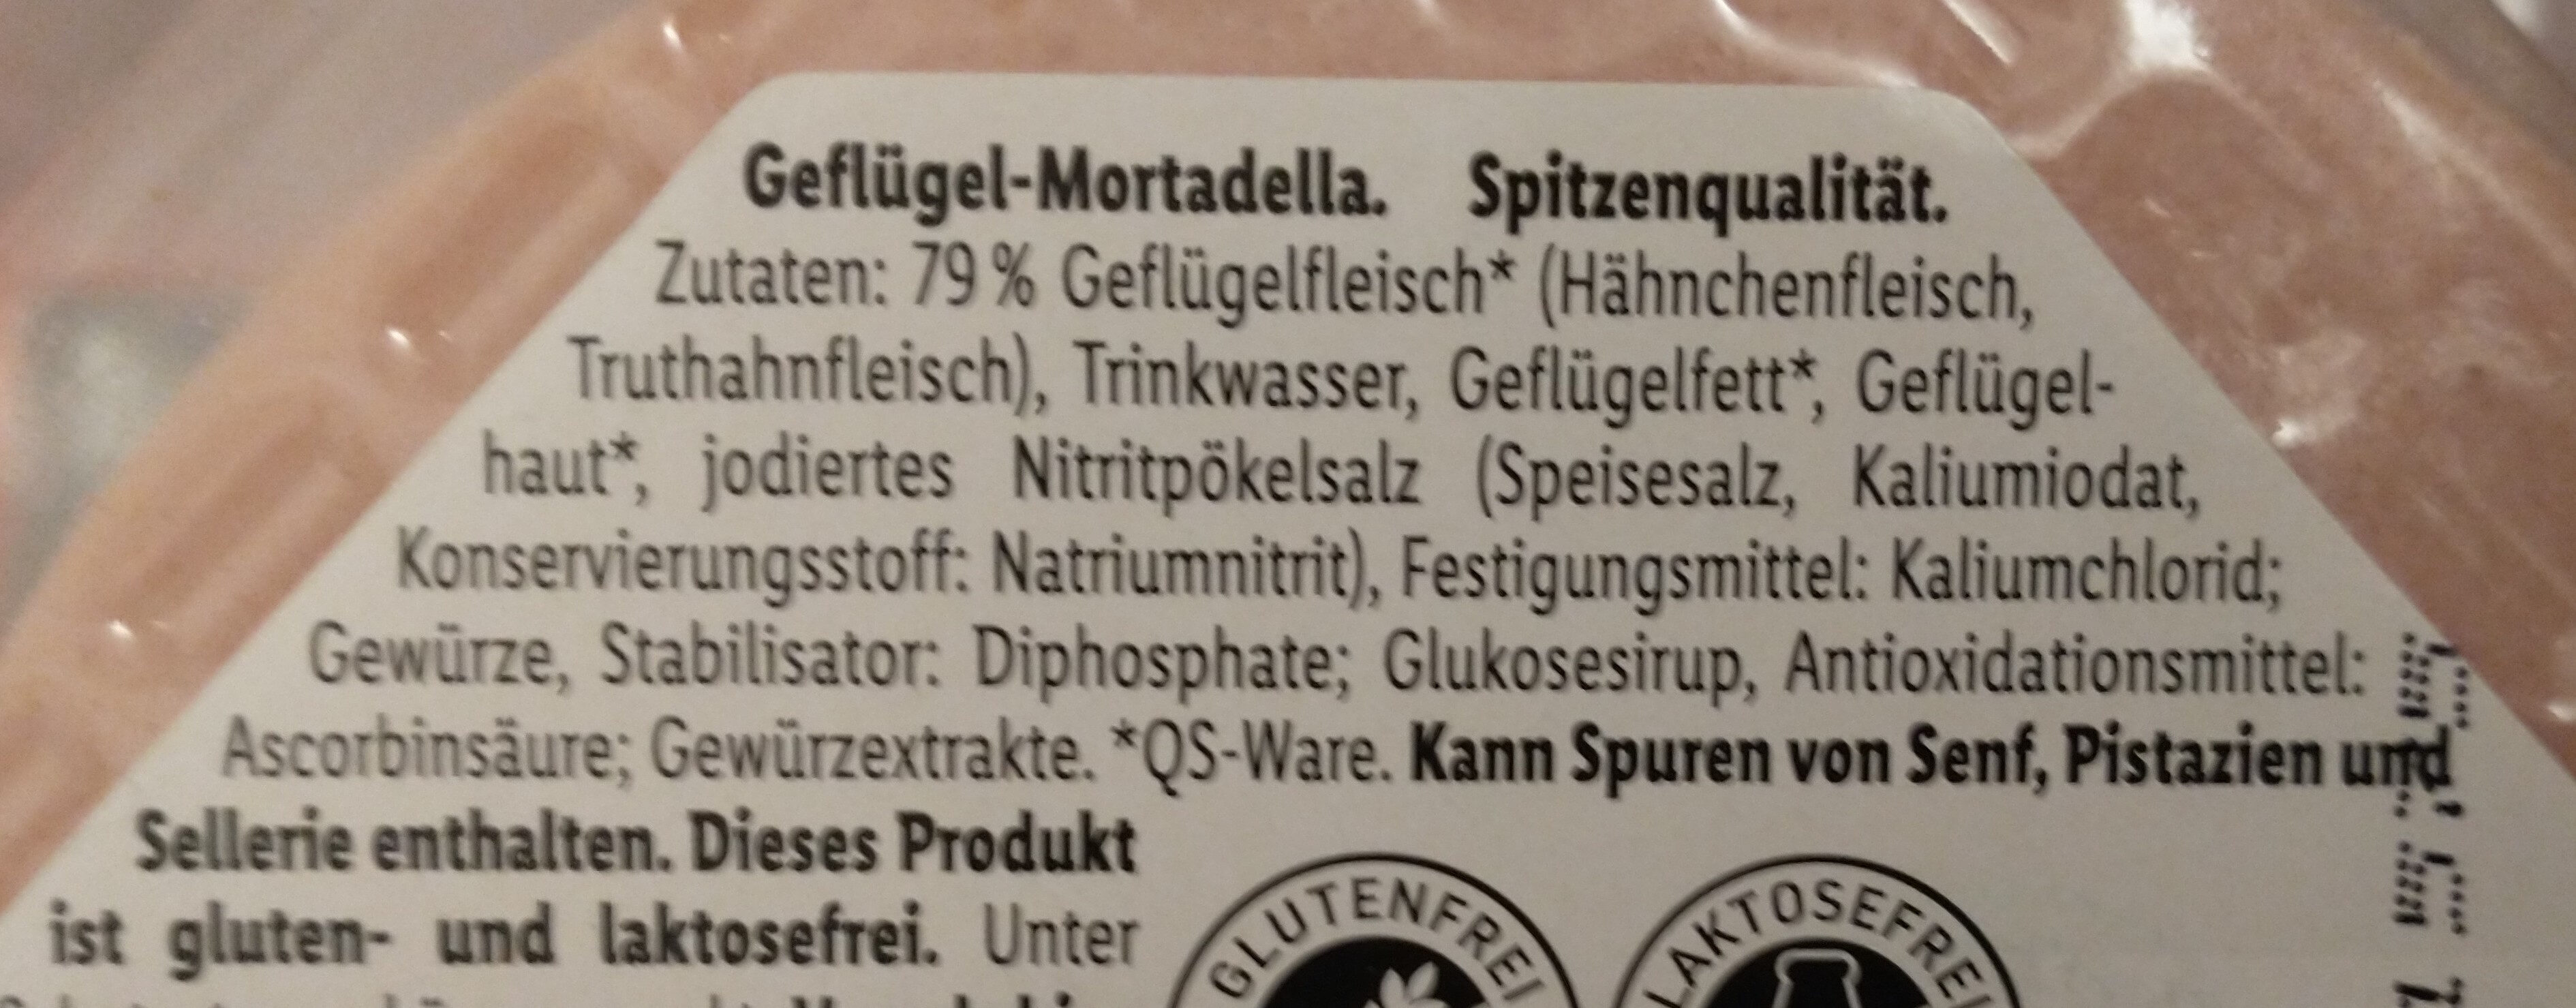 Geflügel-Mortadella - Zutaten - de